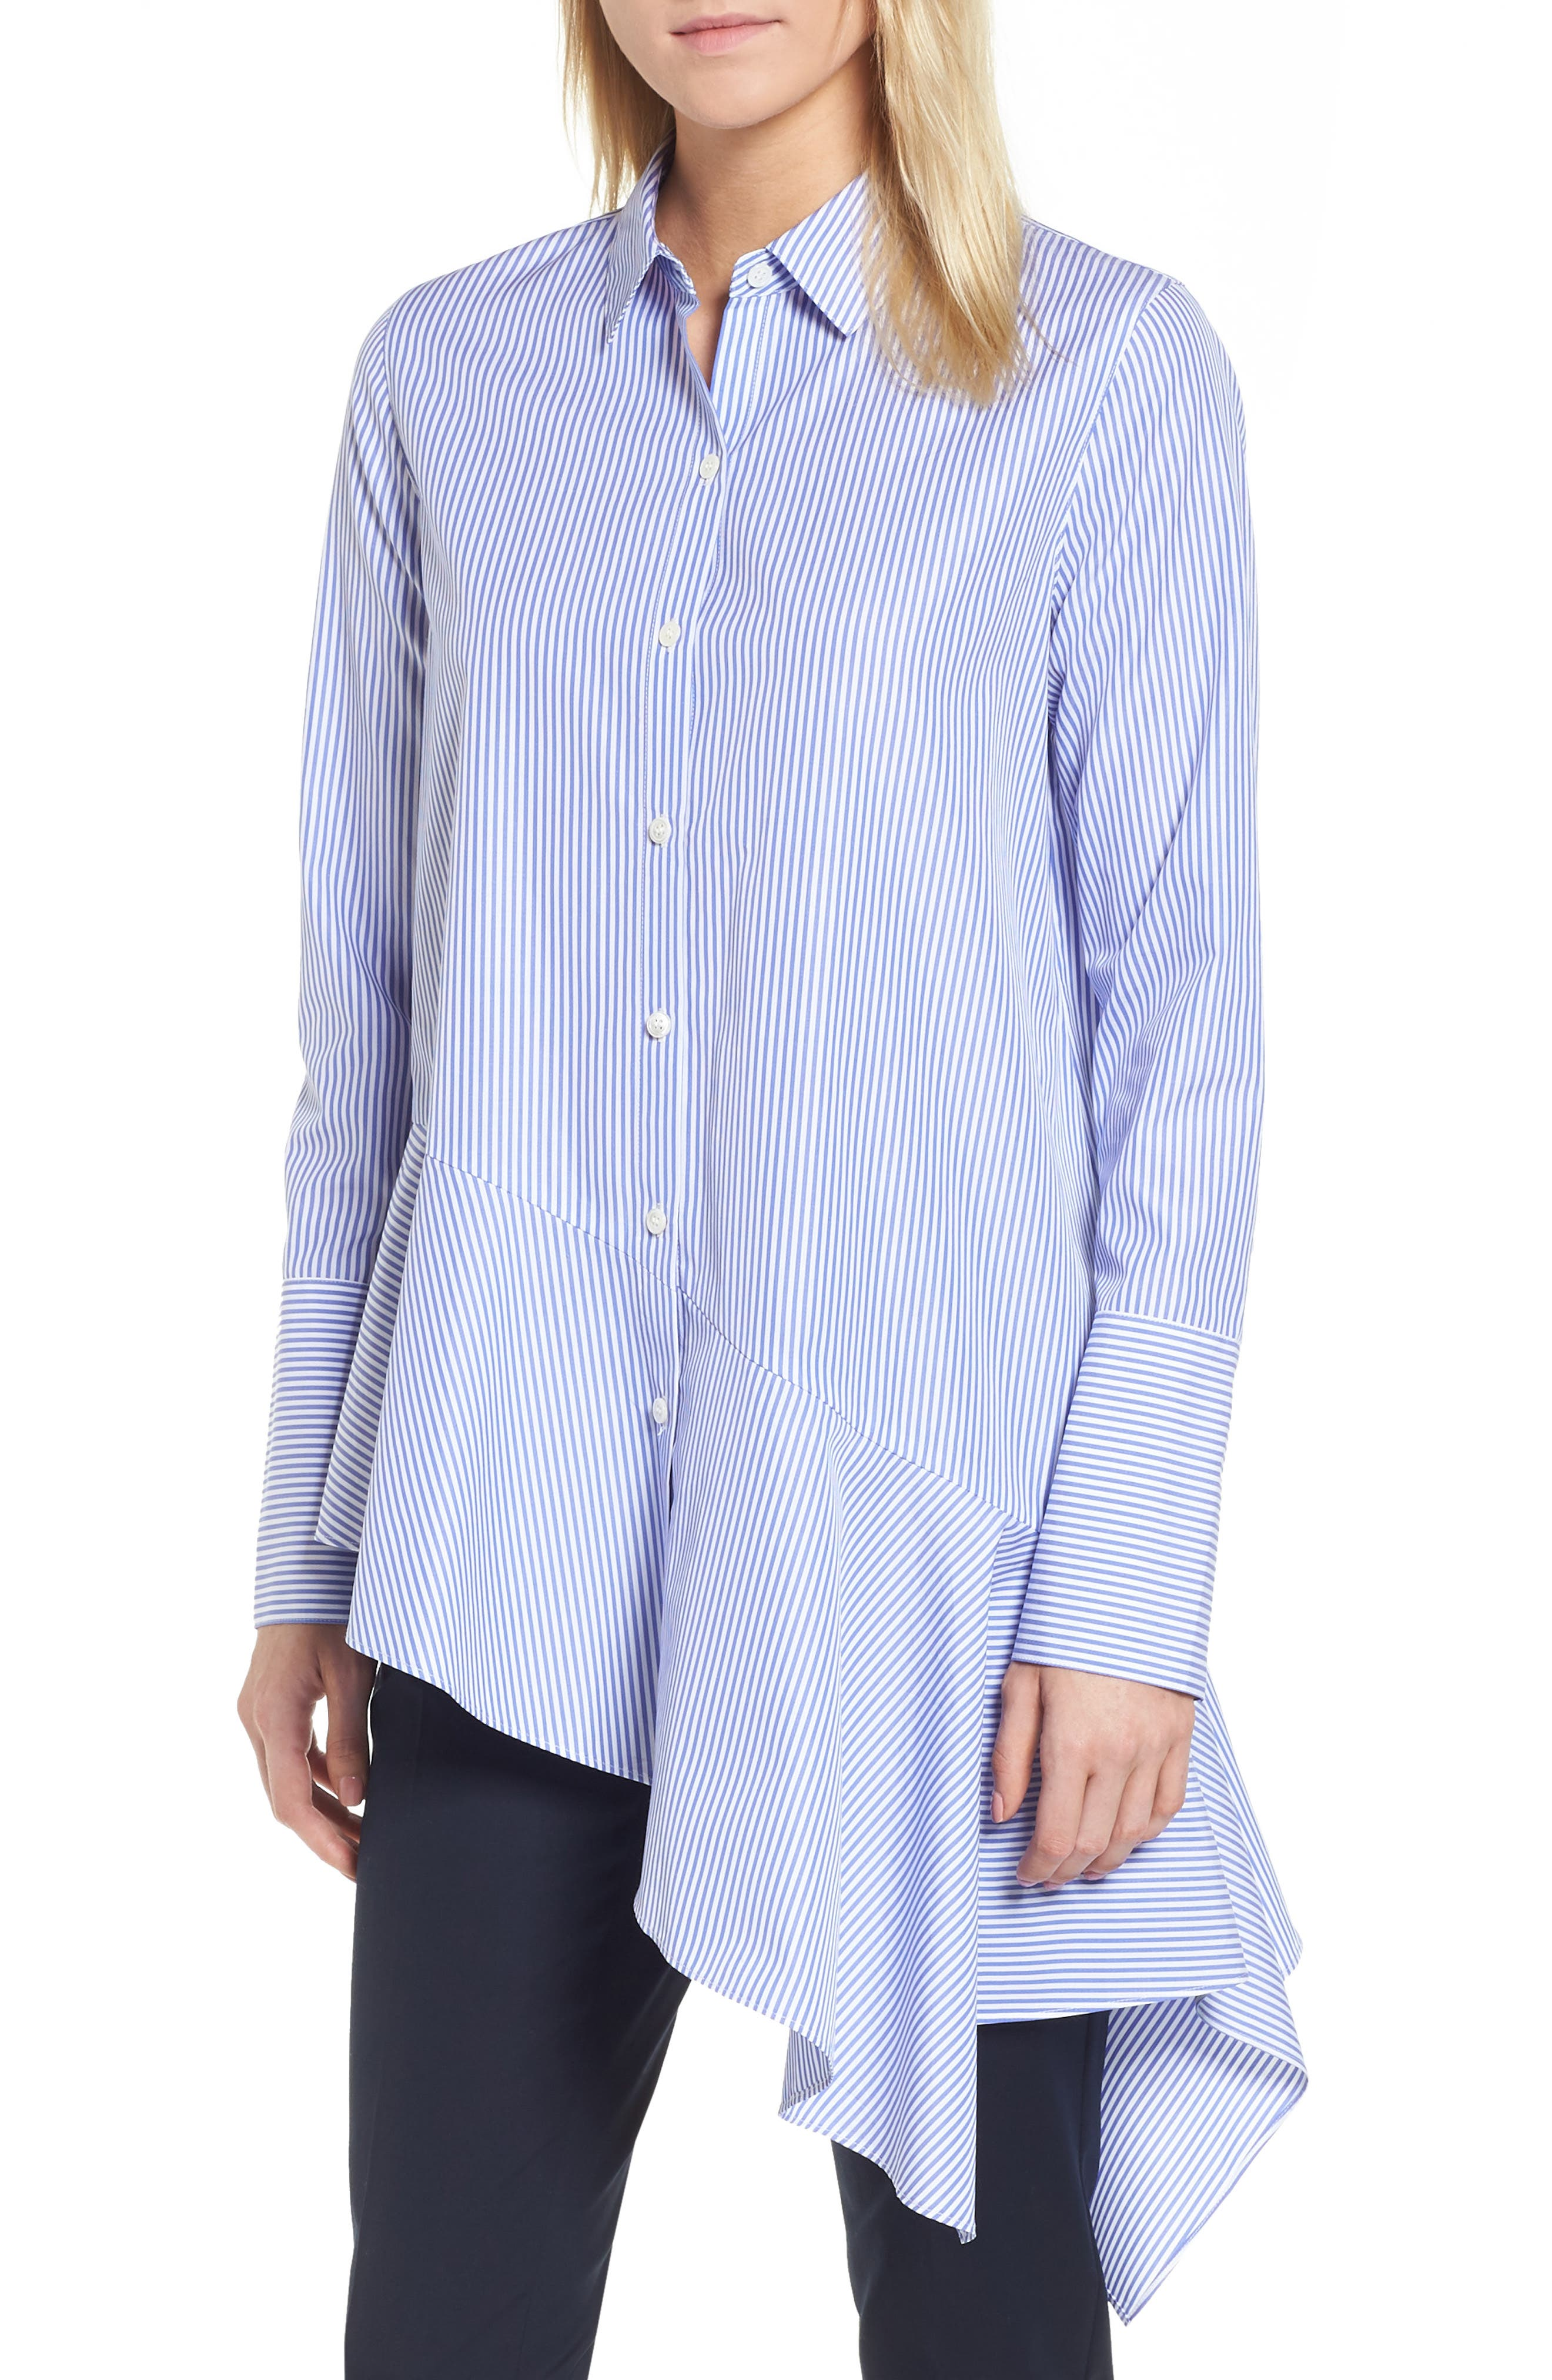 Alternate Image 1 Selected - Nordstrom Signature Asymmetrical Stripe Shirt